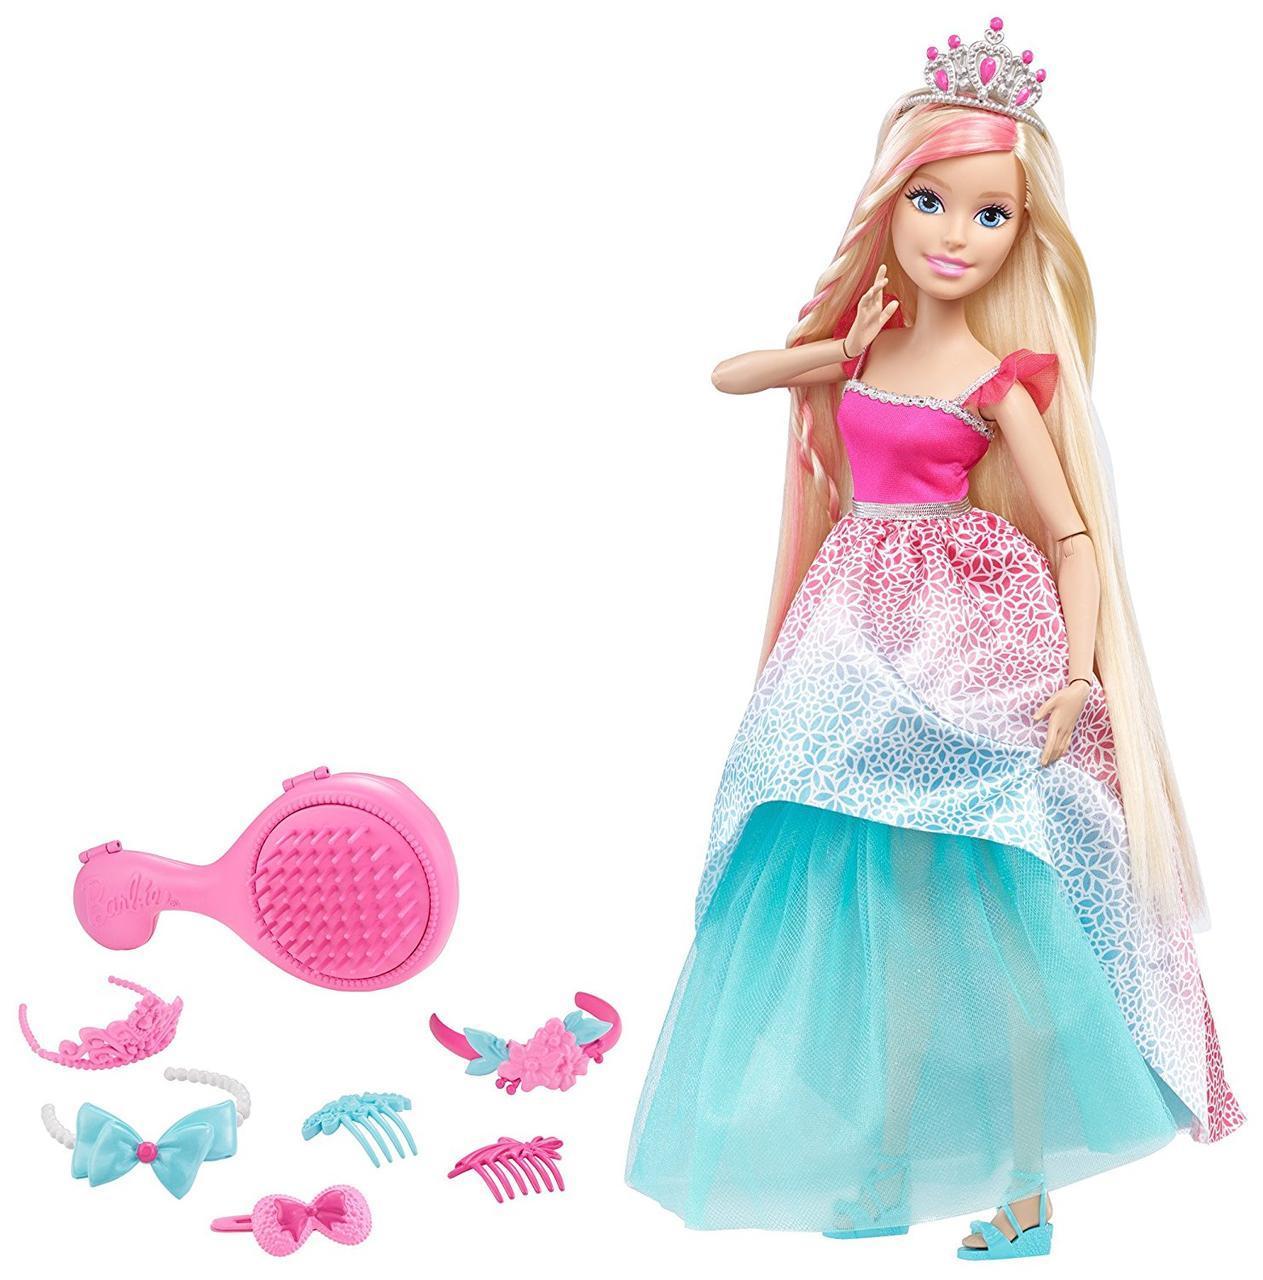 "Кукла Барби Принцесса Блондинка 43 см Дримтопия Barbie Dreamtopia Endless Hair Kingdom 17"" Doll - Blonde"